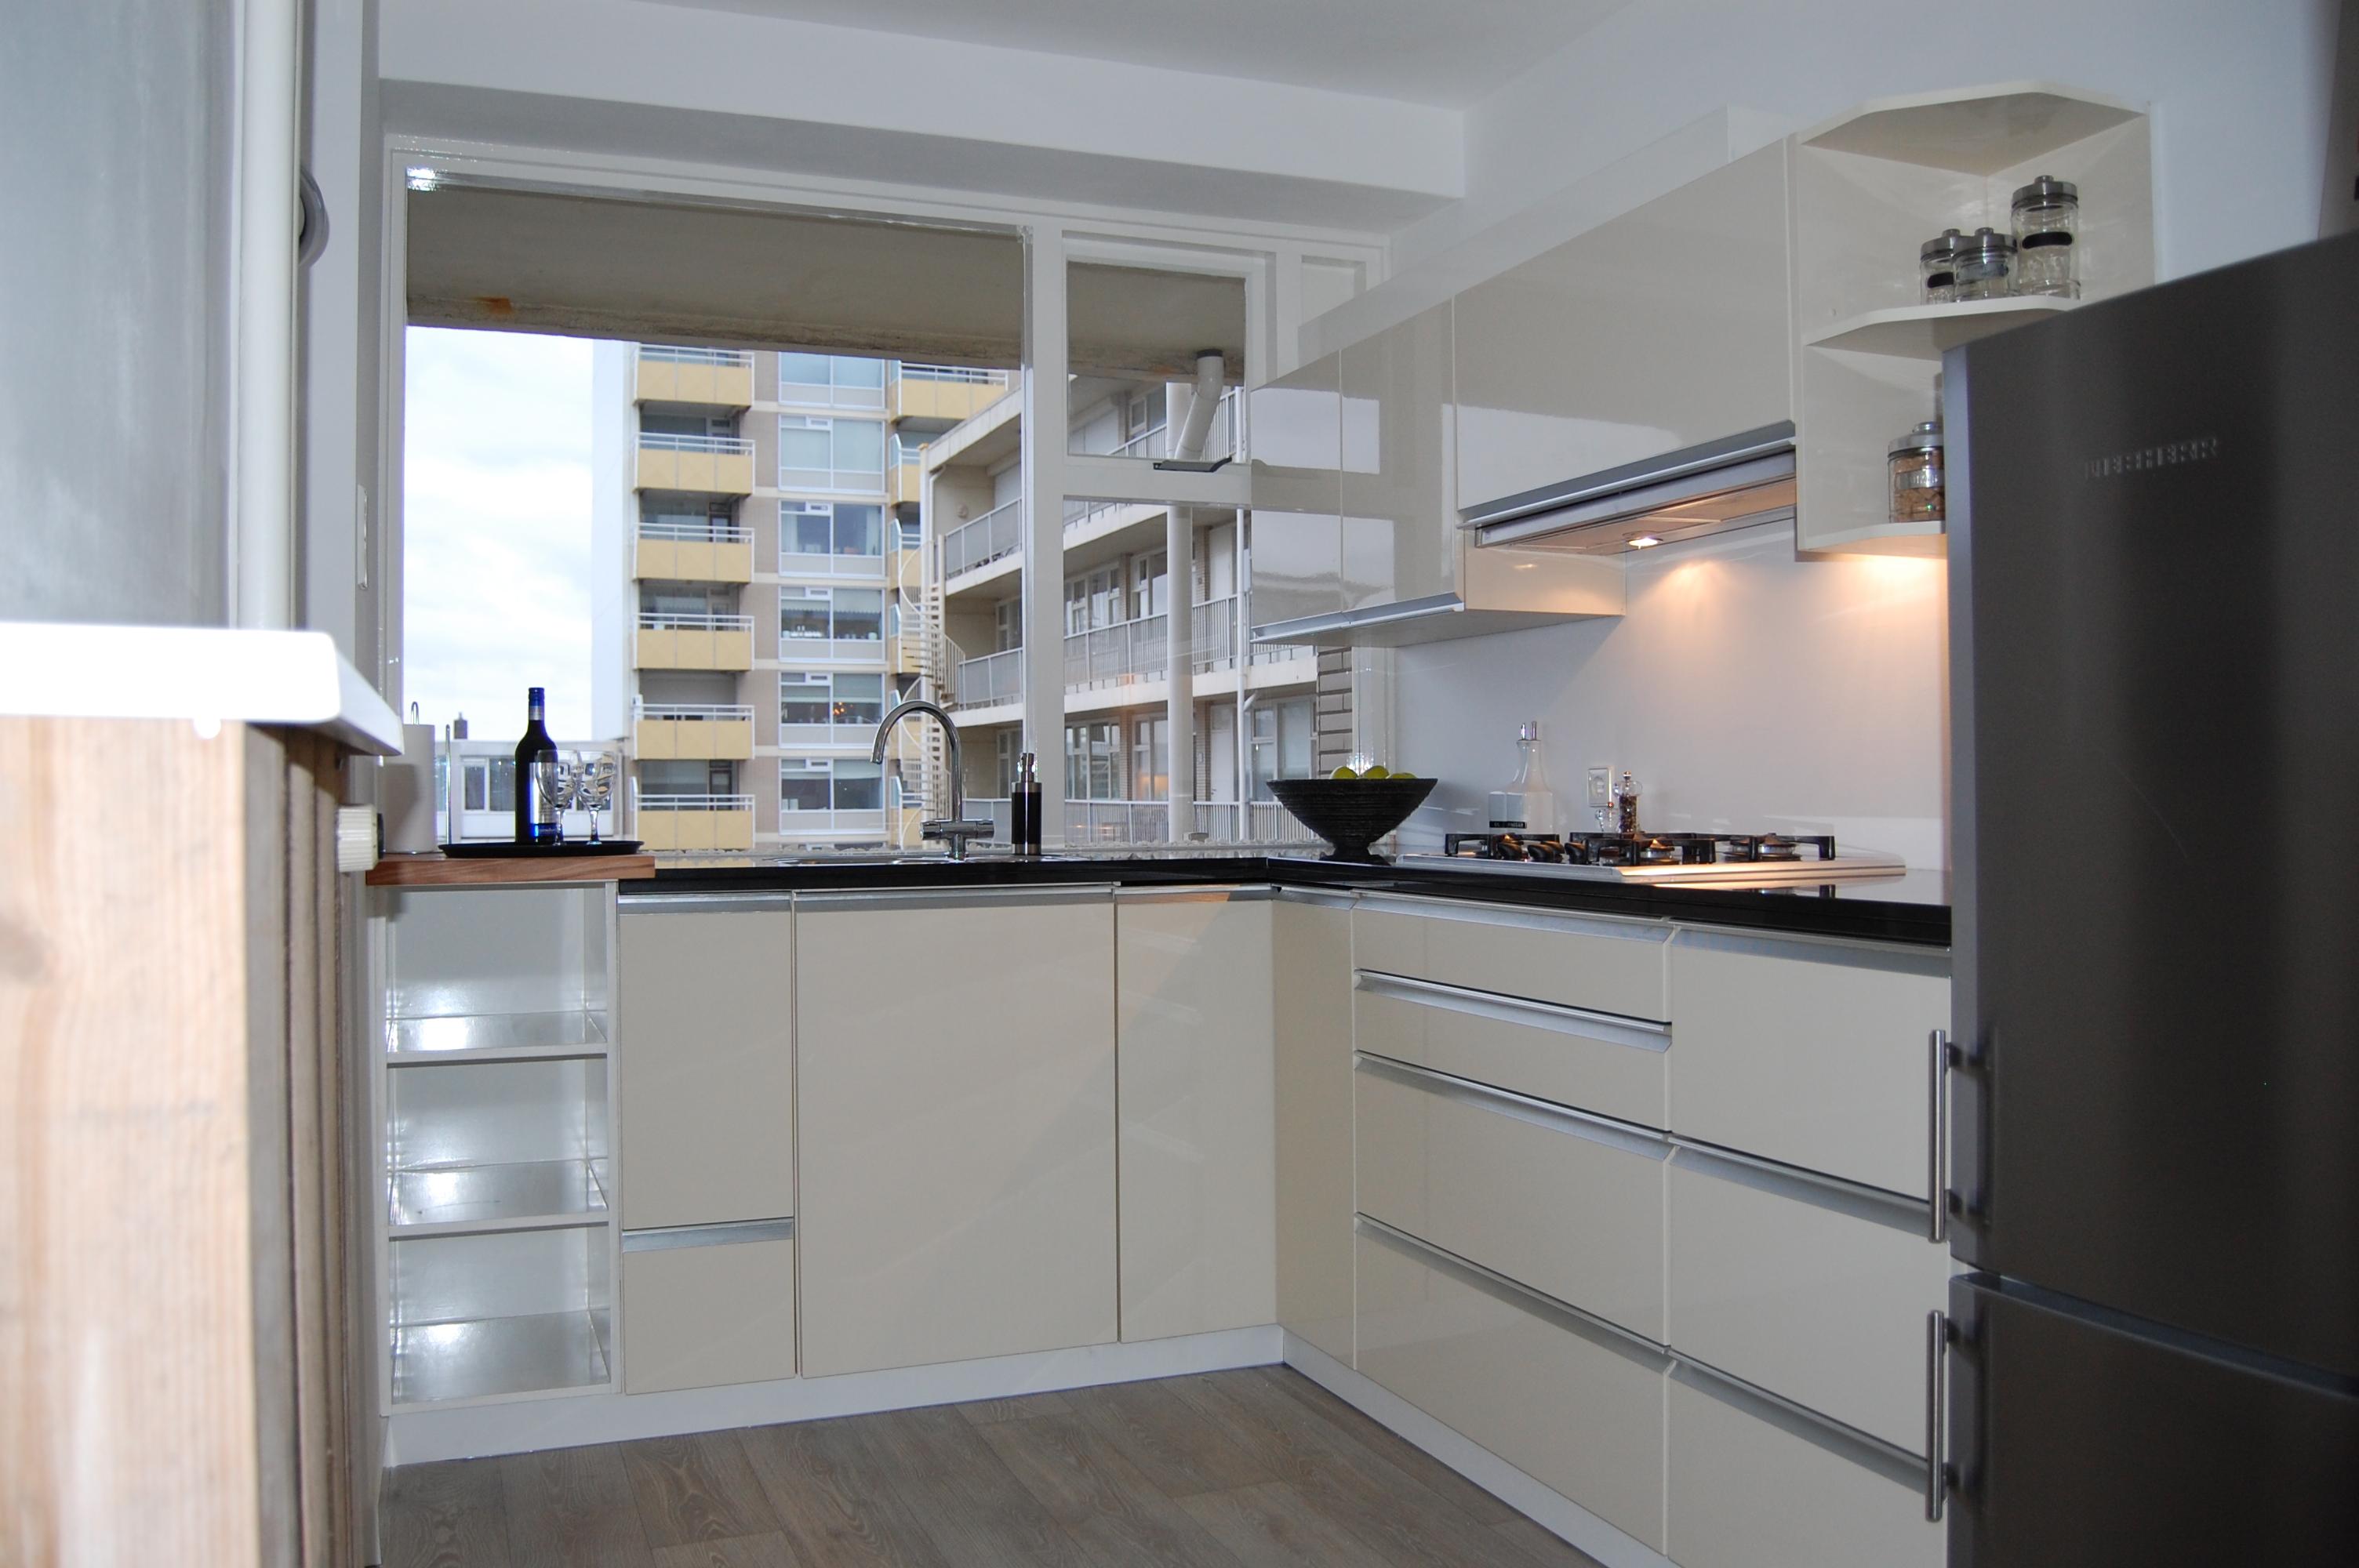 Appartement place2beach for Interieur appartement aan zee